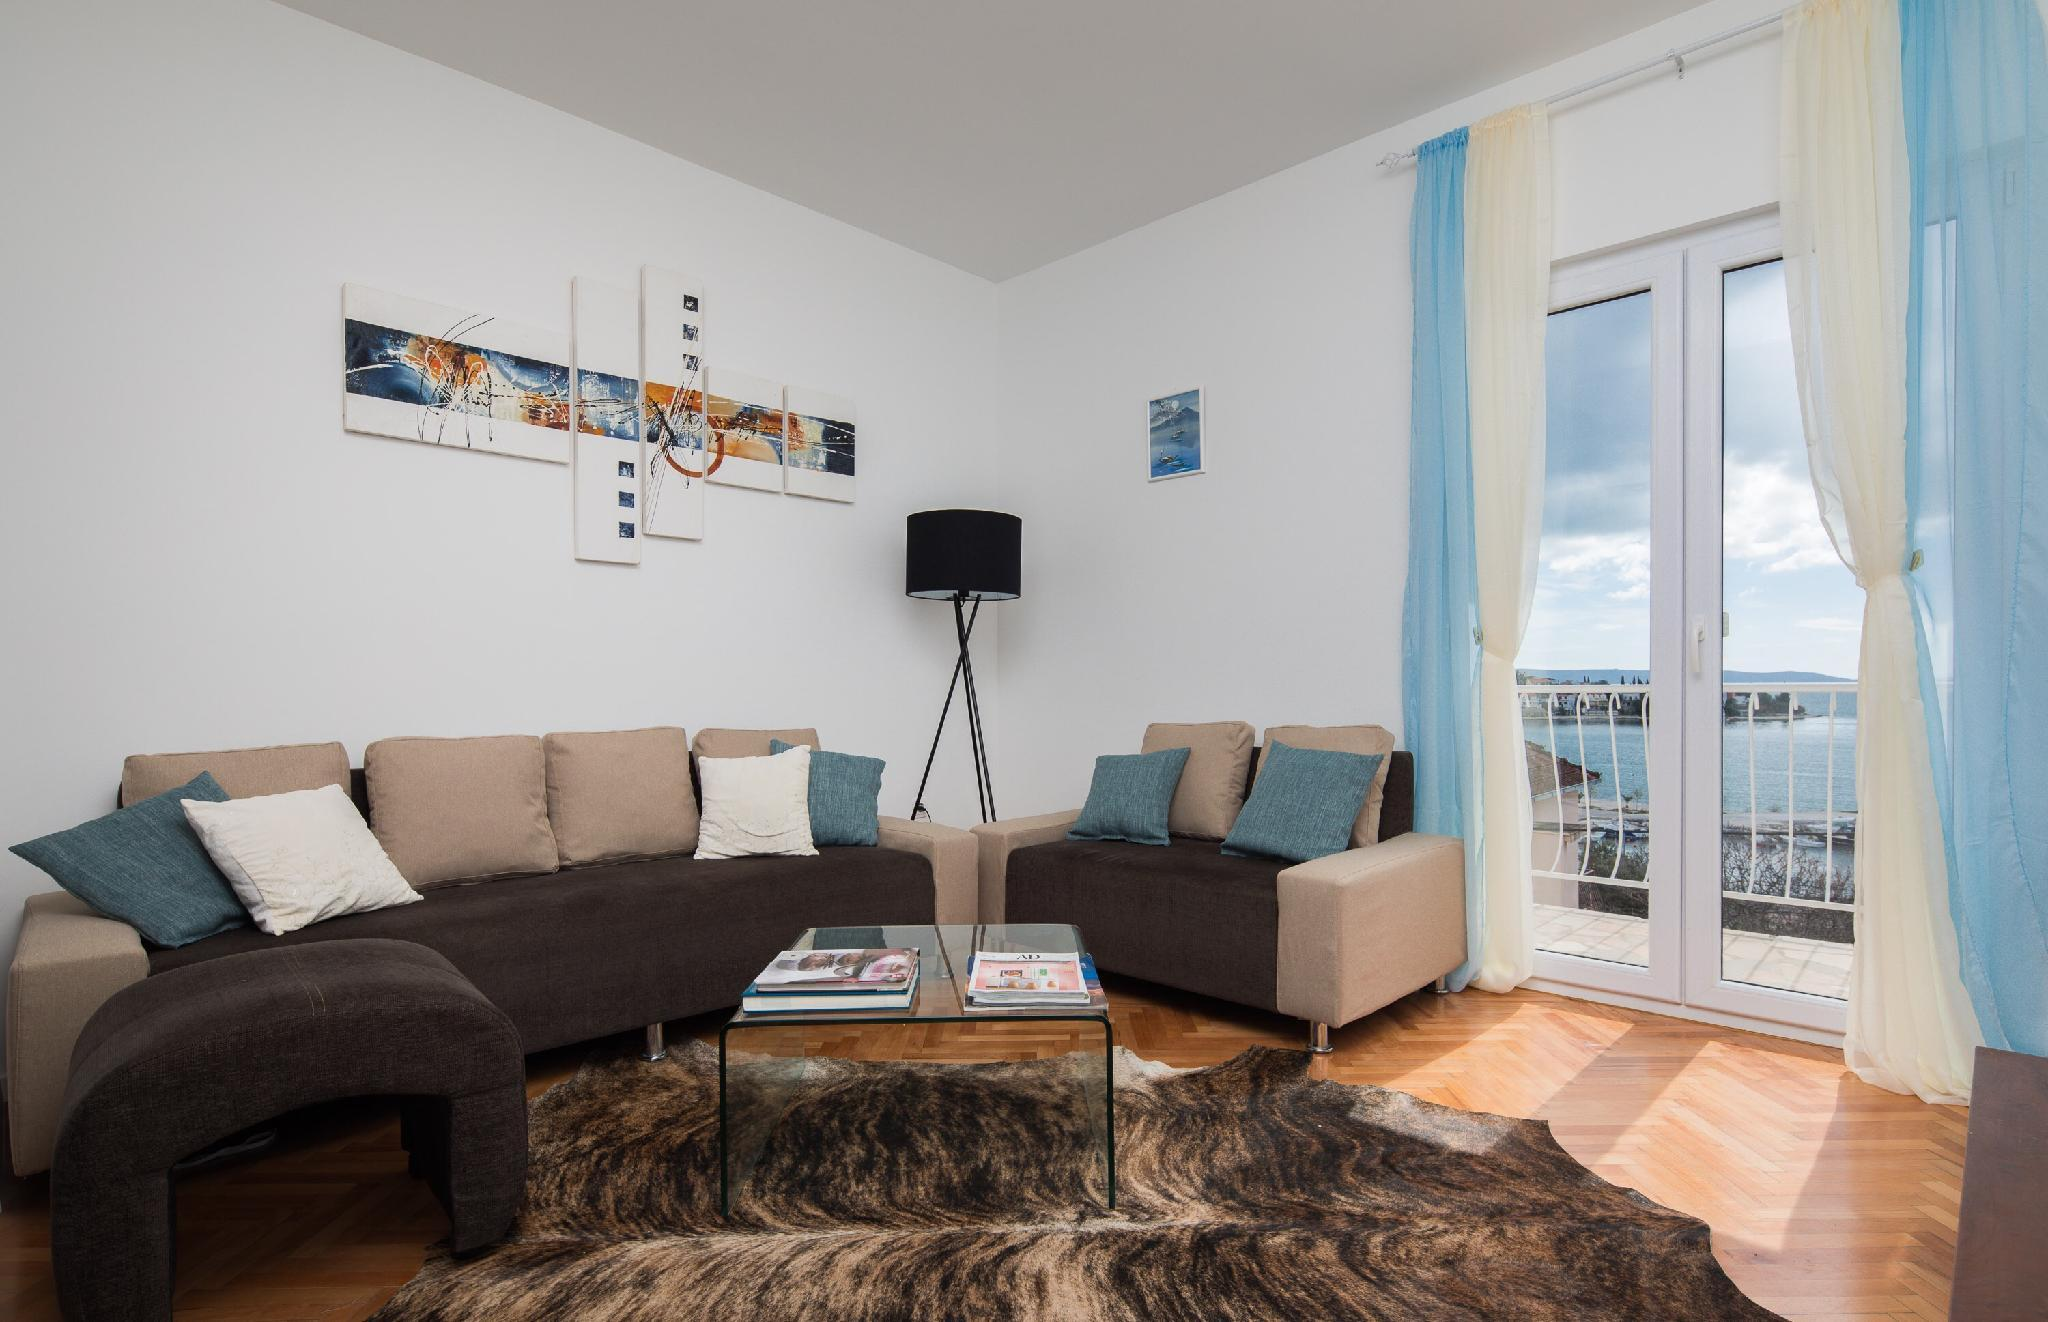 MaKaDo Elegant Apartment With Sea View Balcony